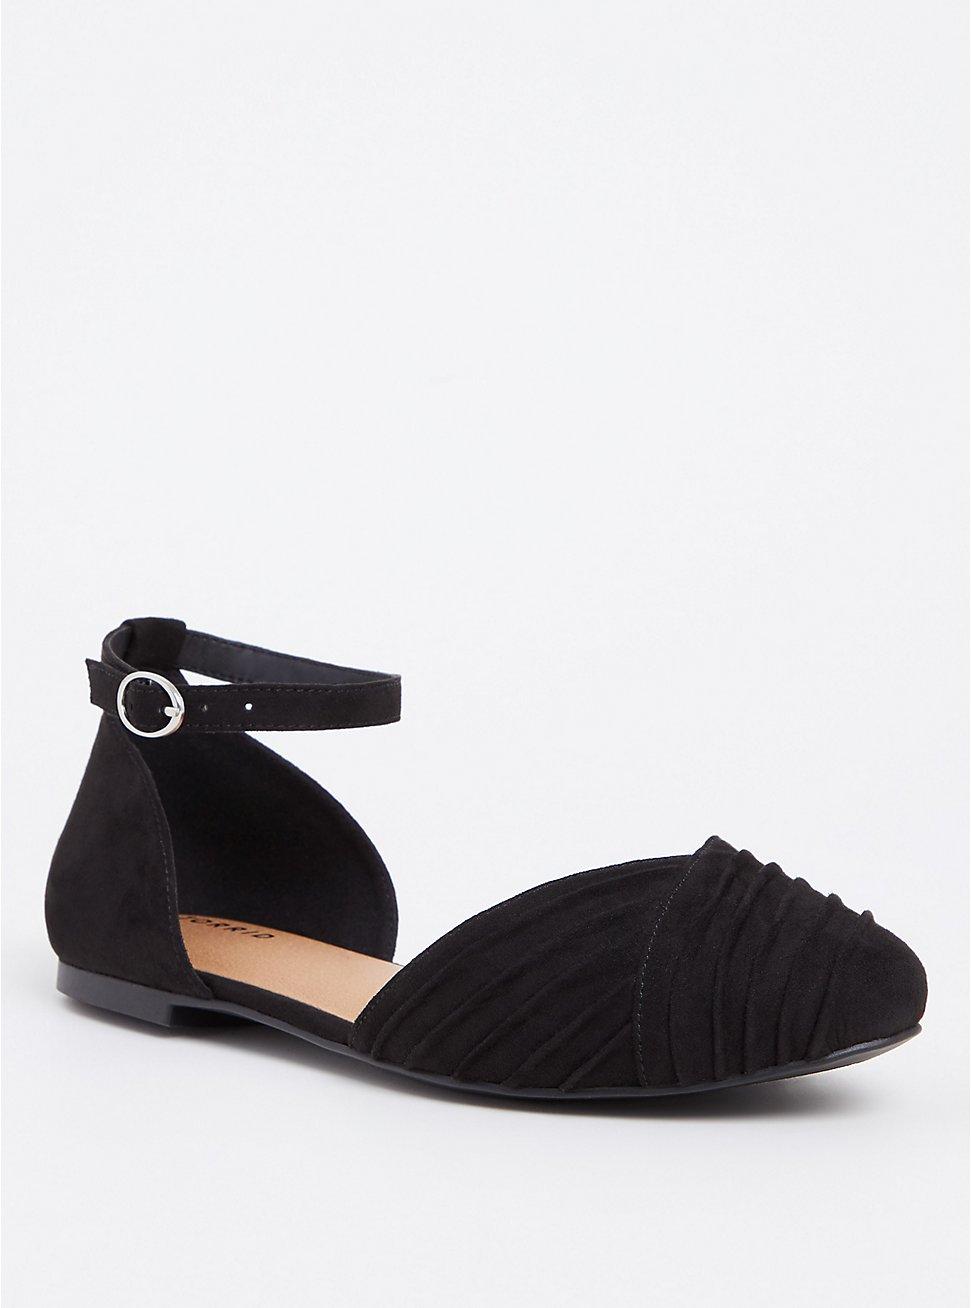 Black Faux Suede Ankle Strap D'Orsay (WW), BLACK, hi-res